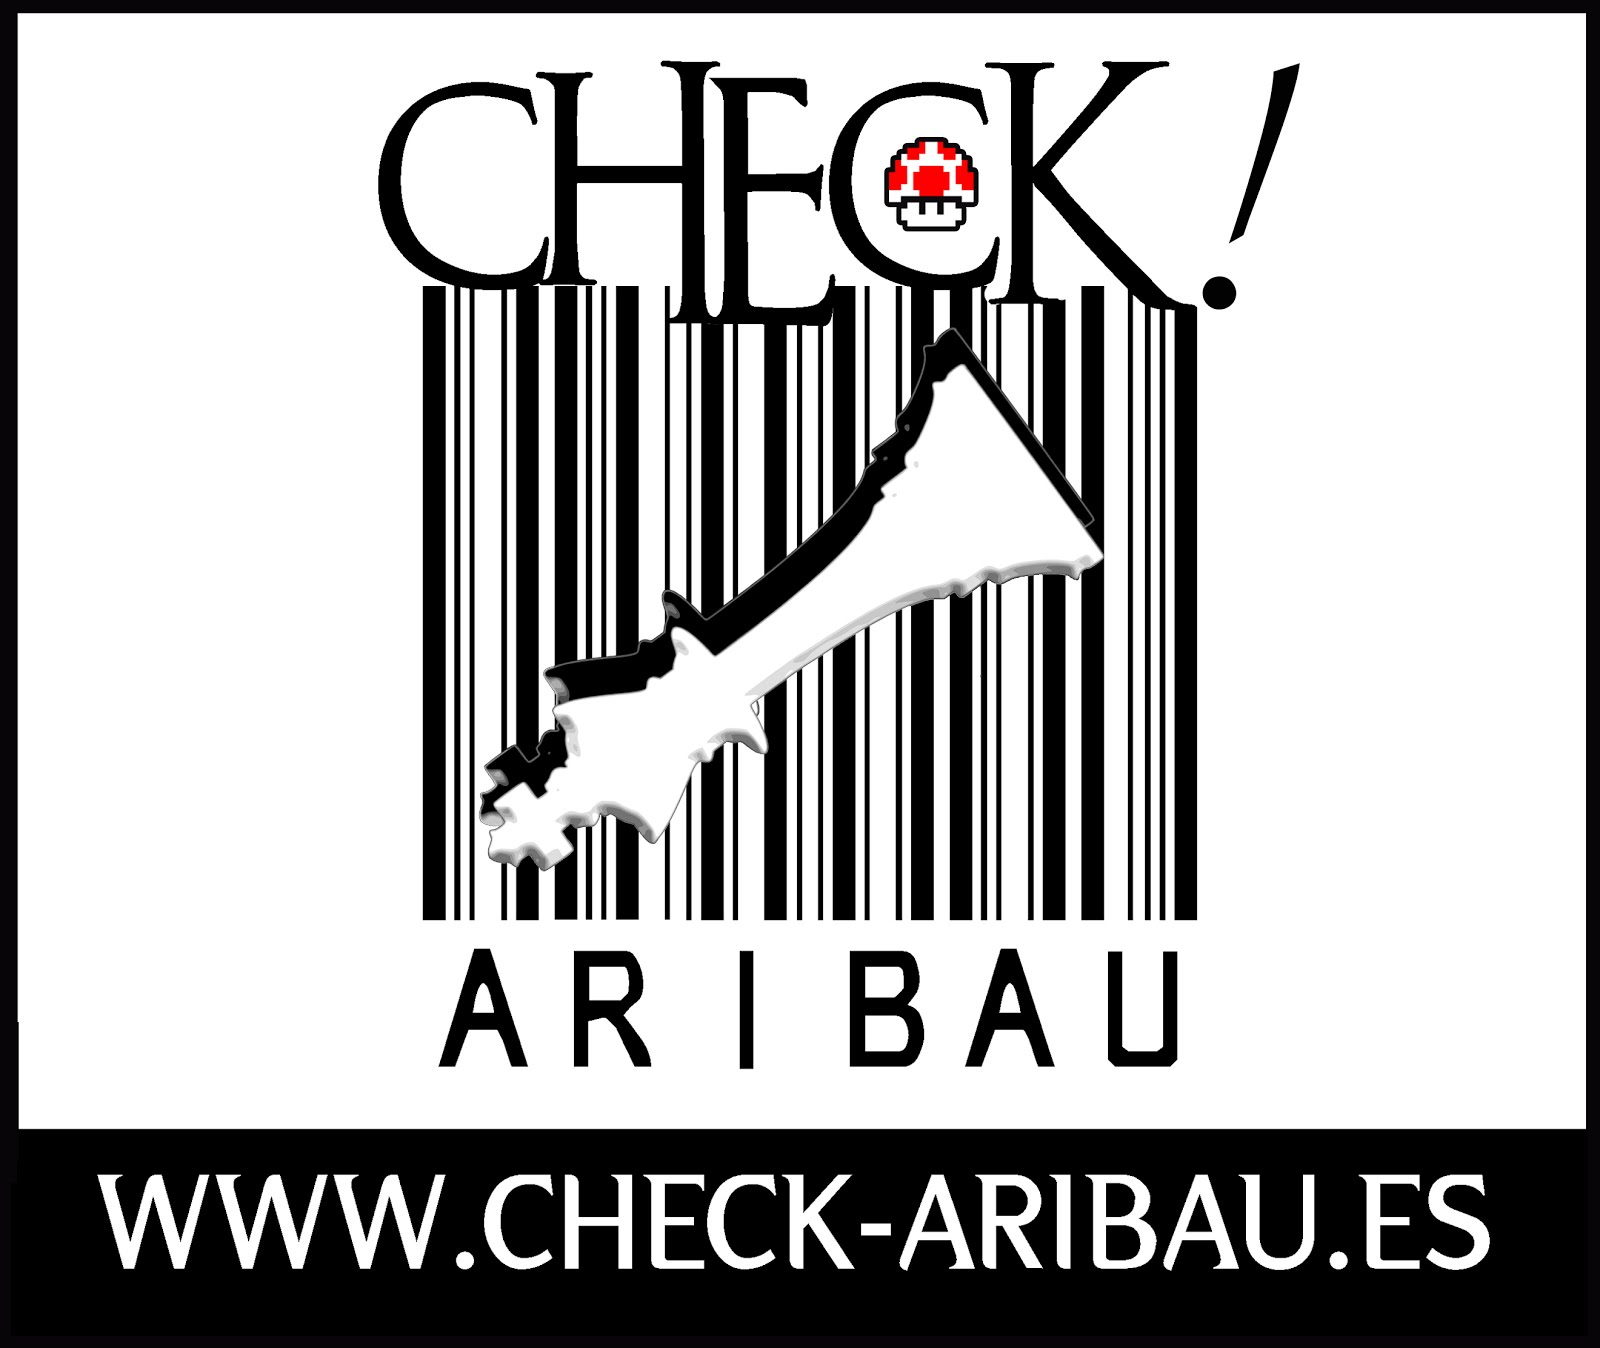 Check Aribau